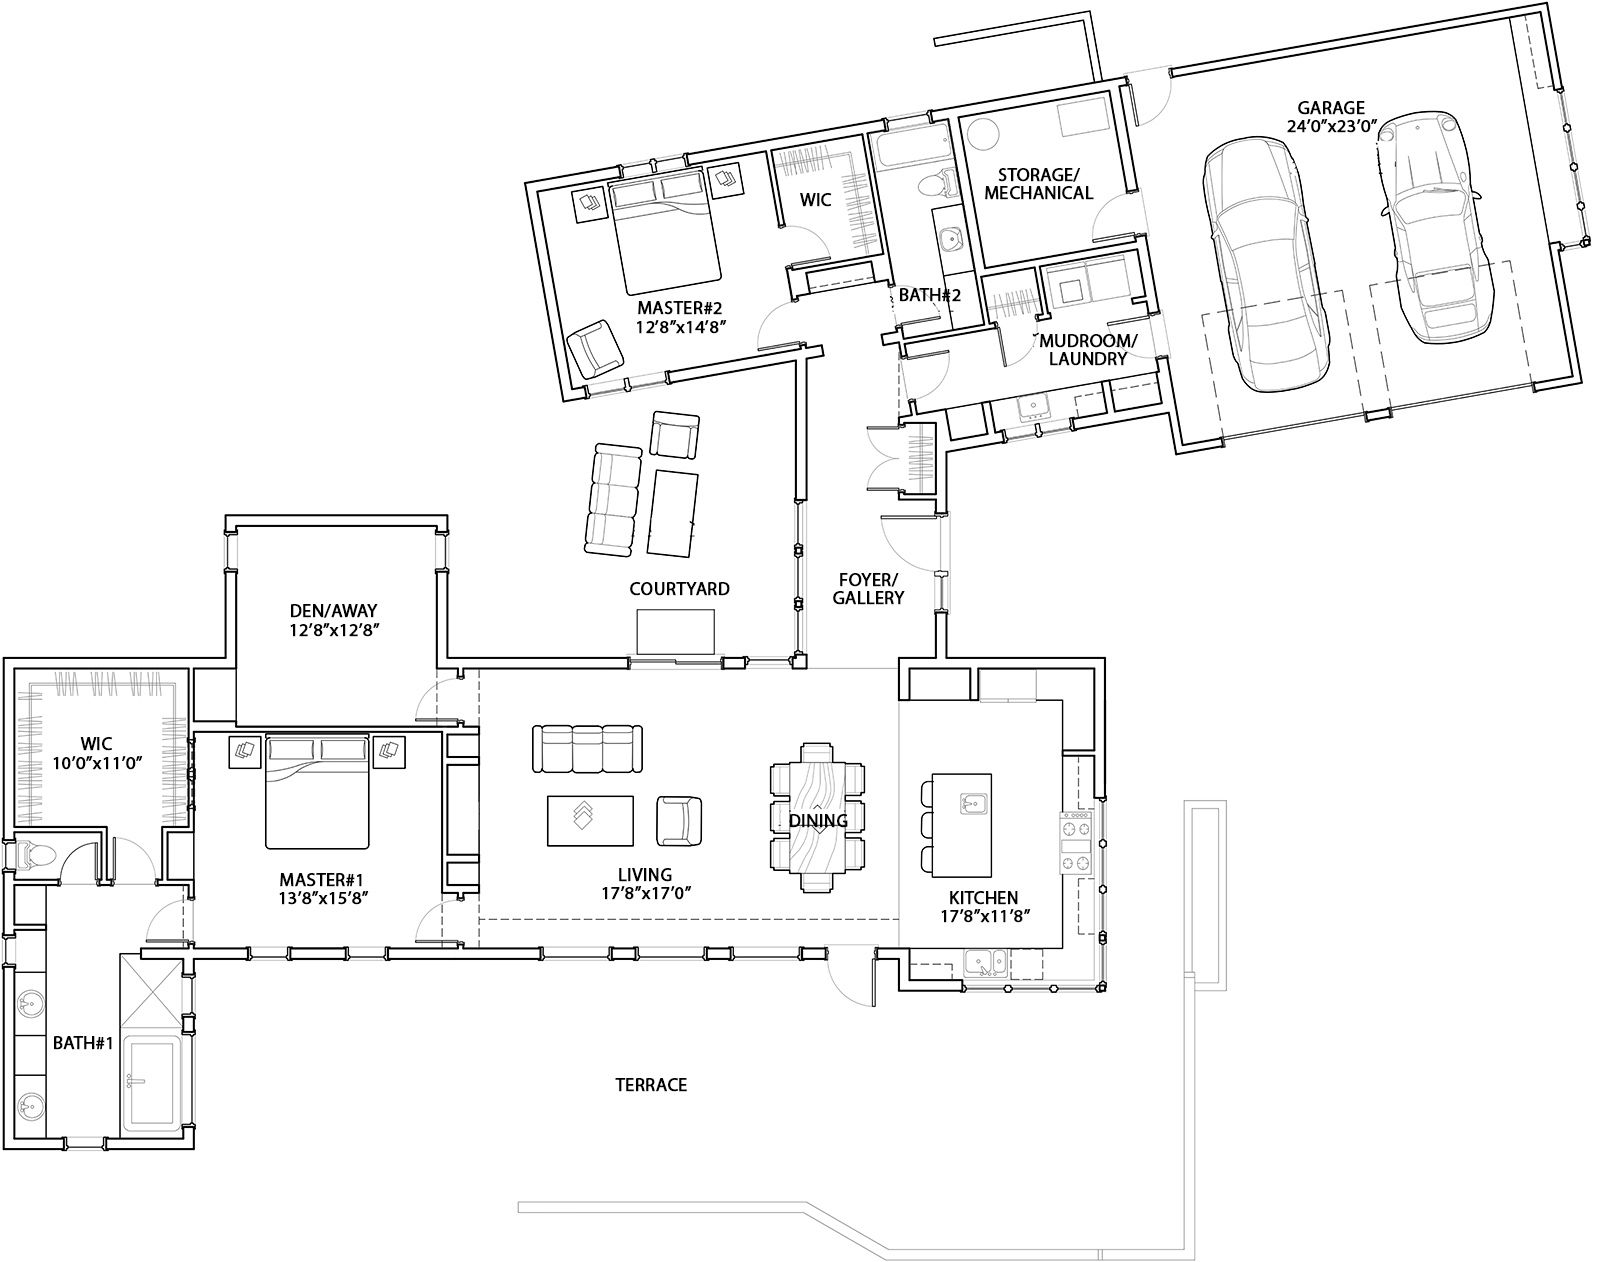 House Plan 5829 00011 Modern Plan 2 331 Square Feet 2 Bedrooms 2 Bathrooms Modern Contemporary House Plans Modern Style House Plans Contemporary House Plans